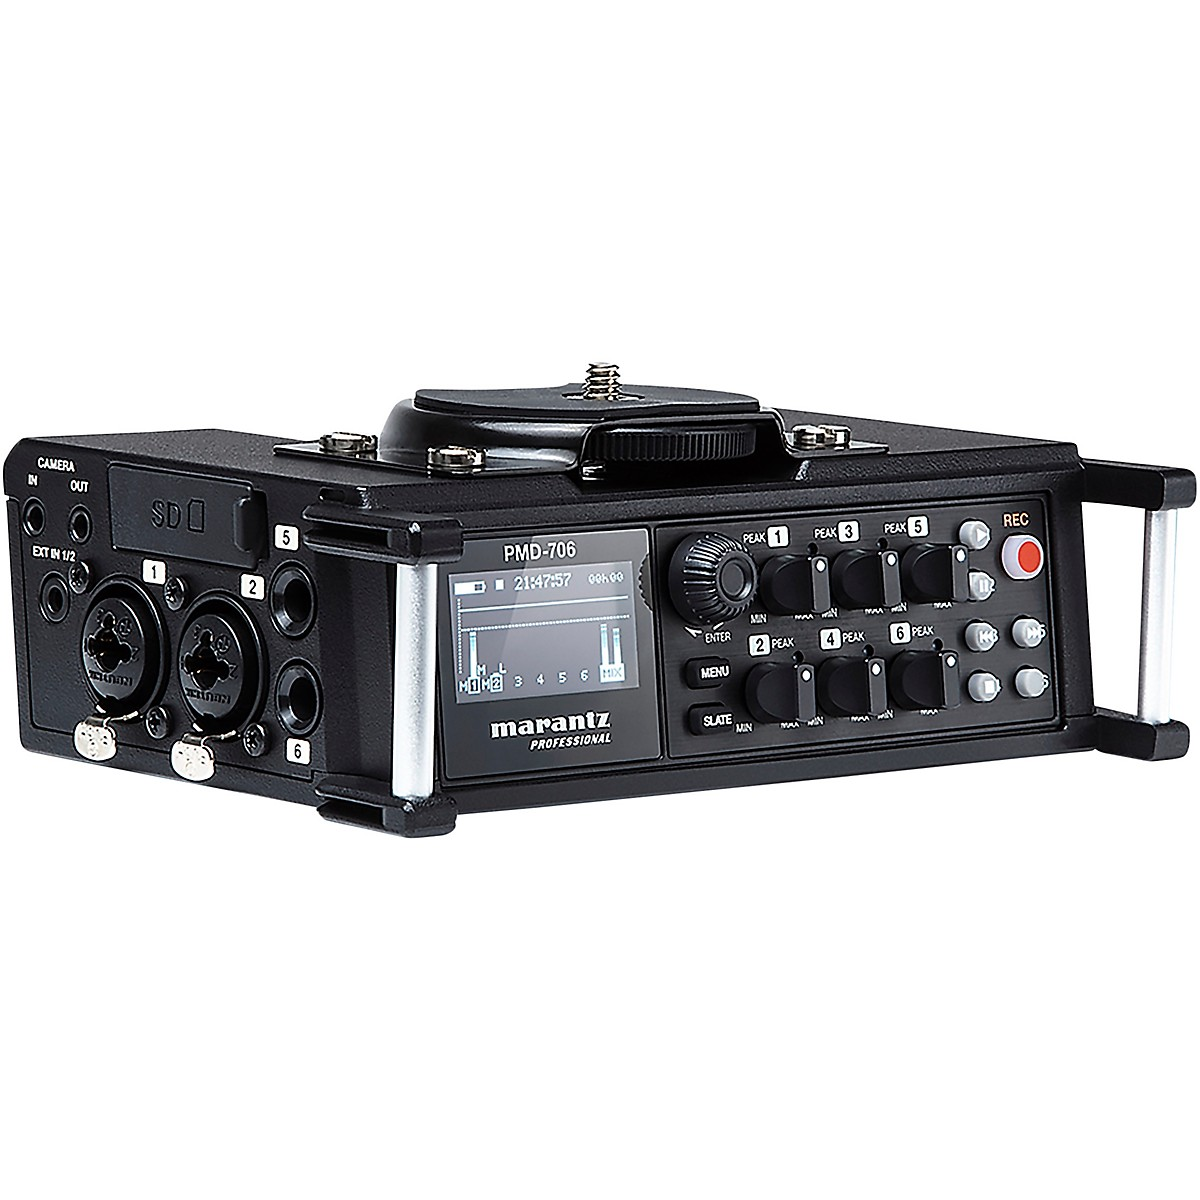 Marantz Professional PMD-706 6-Channel Professional Field Recorder